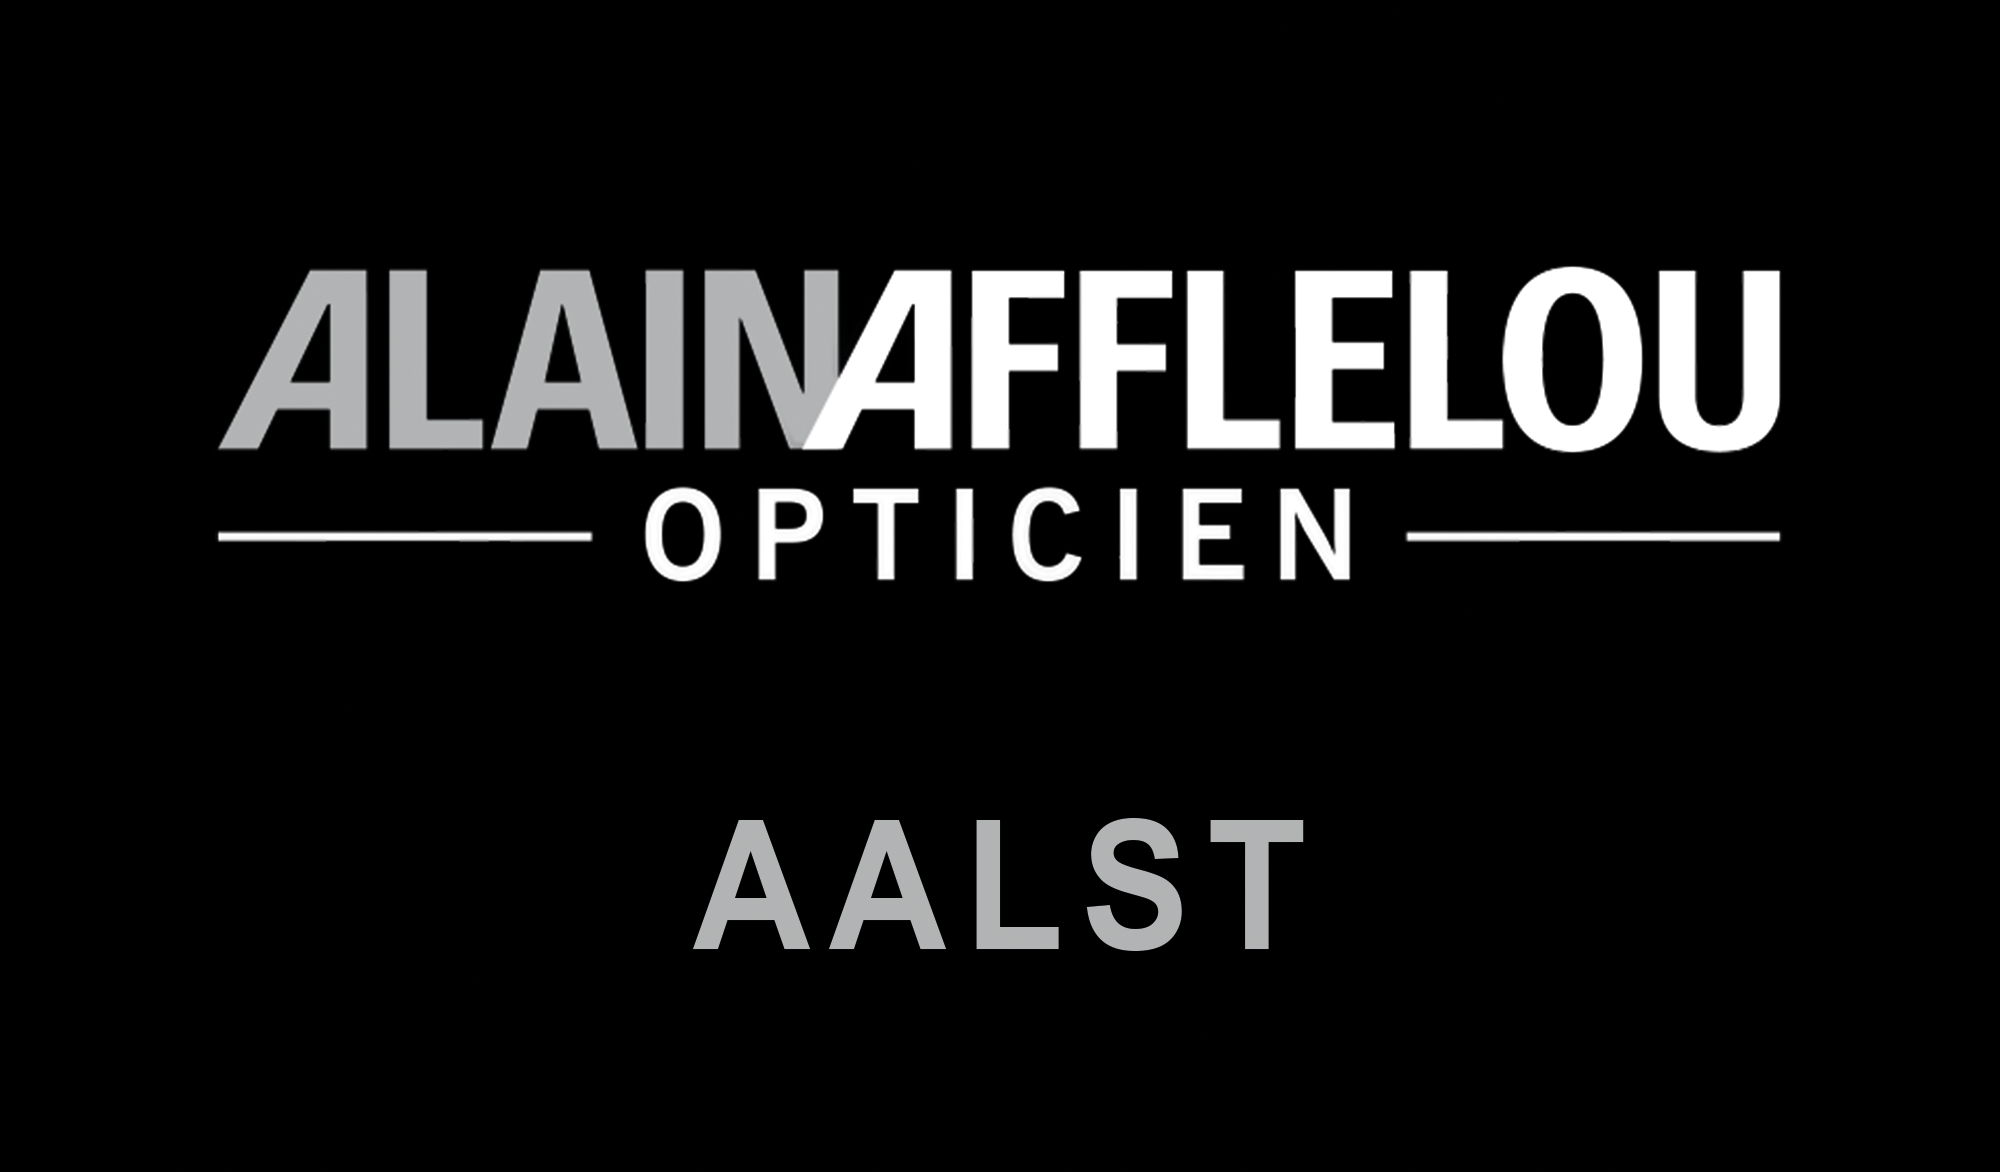 Alain Afflelou Aalst